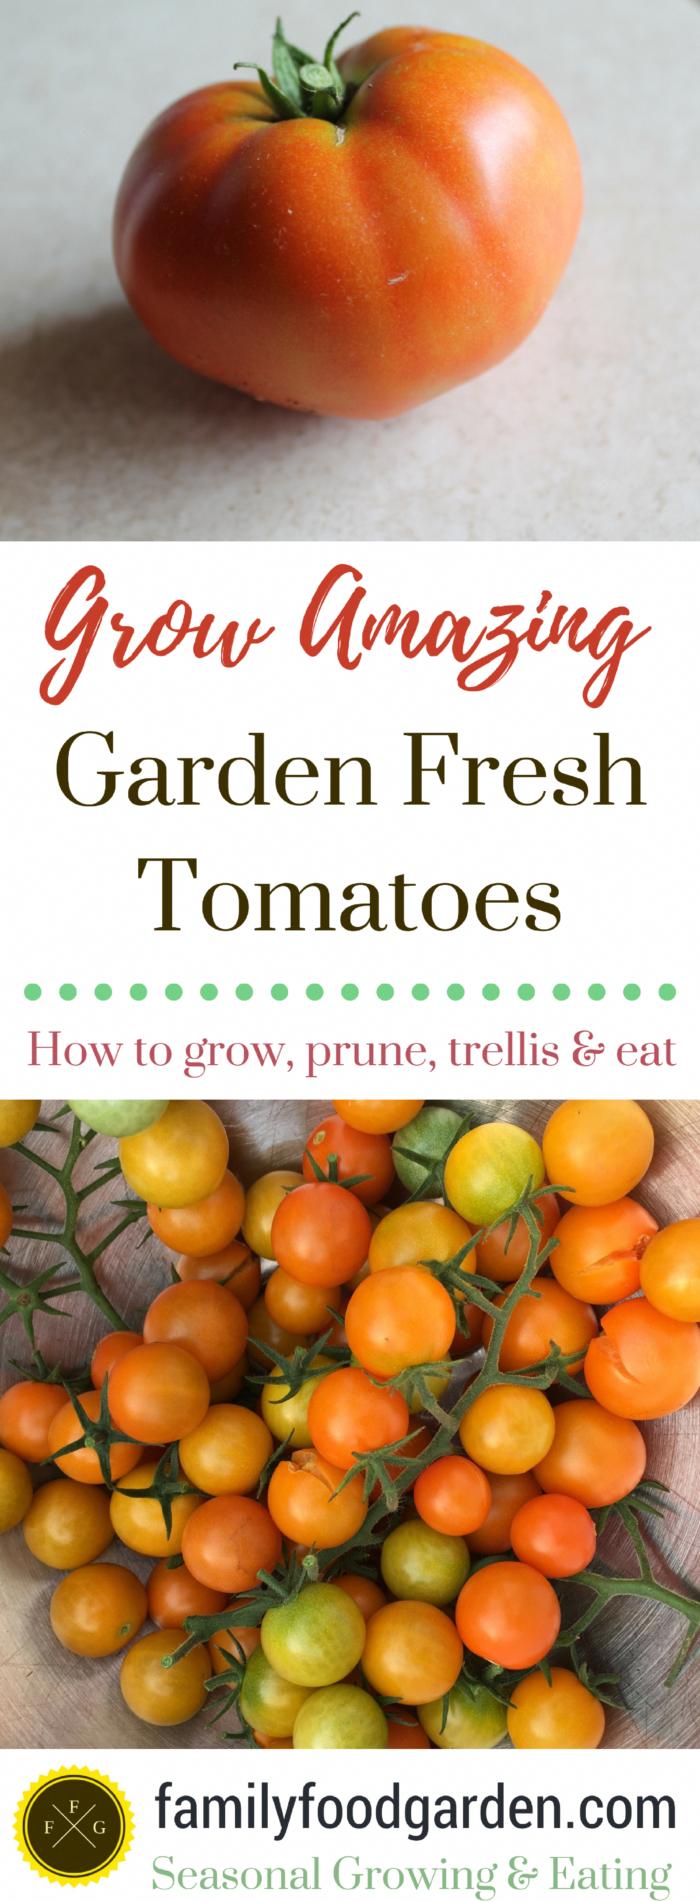 Easy Food Tips #FastFoodManagementTips  #GardeningTipsForGrowingTomatoes #tomatenzüchten